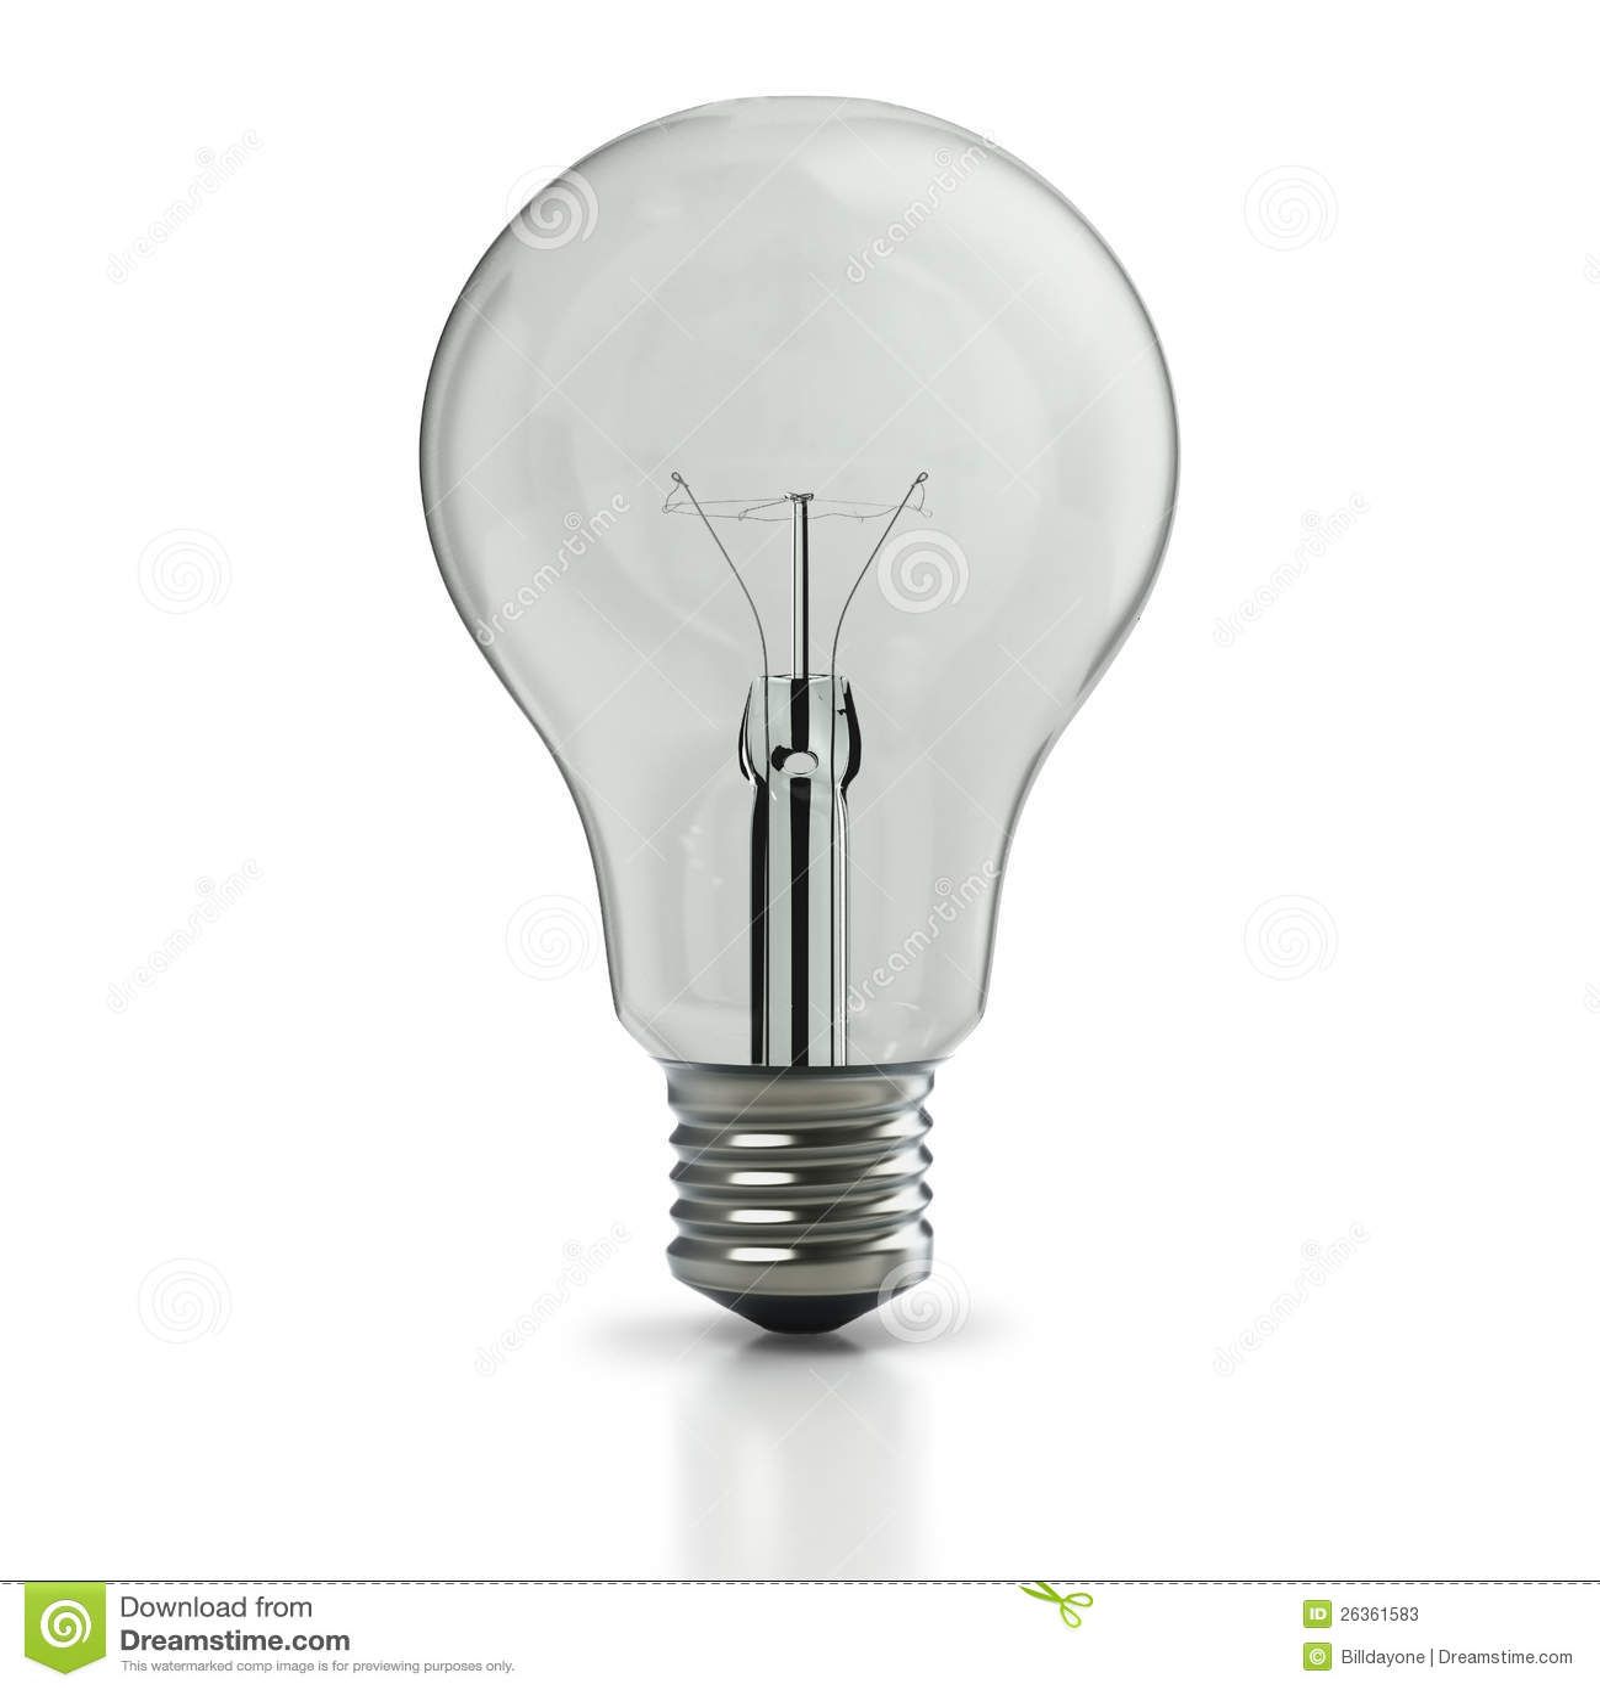 Original Incandescent Light Bulb Stock Photos Image 26361583